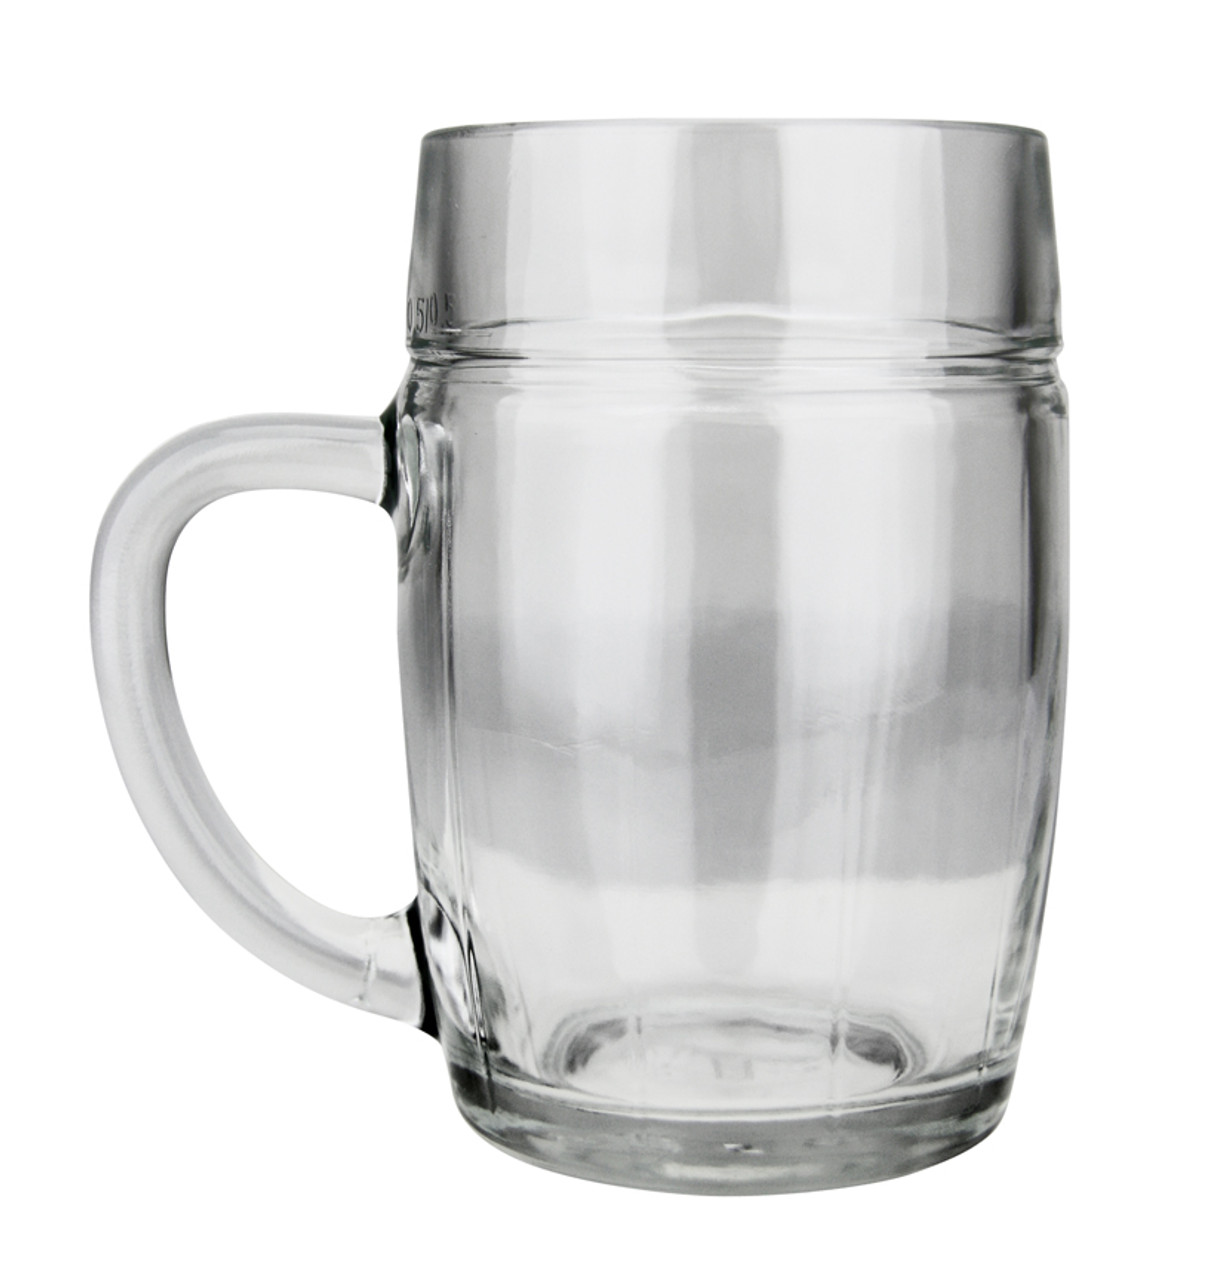 Plain .5 Liter Glass Beer Mug Perfect for Engraving